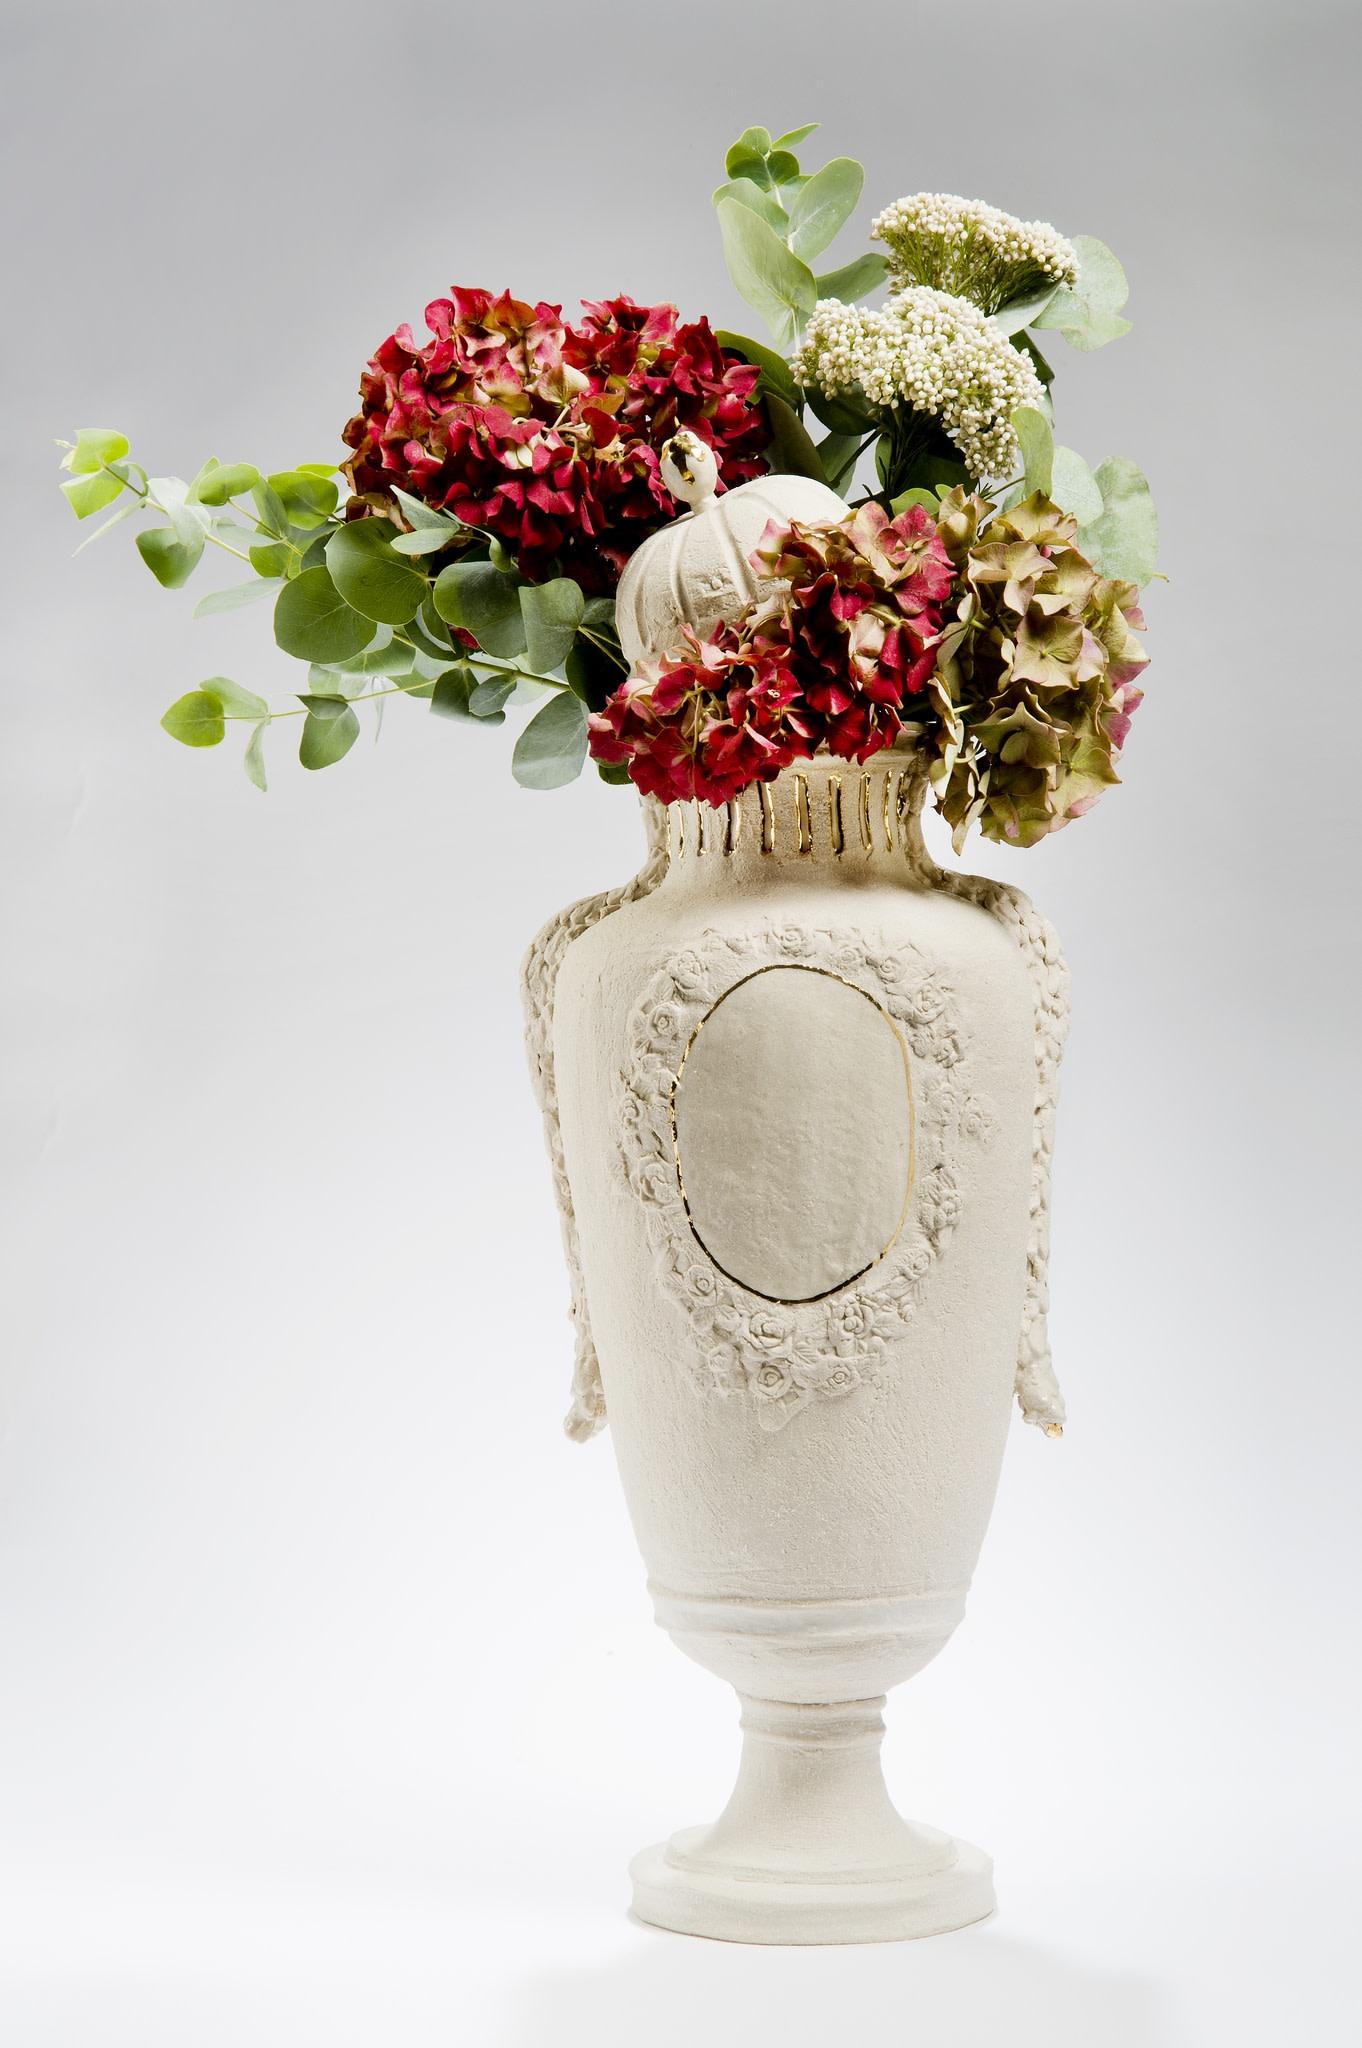 "<span class=""link fancybox-details-link""><a href=""/exhibitions/32/works/artworks73/"">View Detail Page</a></span><div class=""artist""><strong>Amy Hughes</strong></div><div class=""title""><em>Trésor Découvert Series; Lidded Earthstone Vase</em>, 2014</div><div class=""medium"">Hand built grogged stoneware body, transparent glaze with 22 carat gold lustre, parian cast flower additions</div><div class=""dimensions"">44 x 24 cm<br>17 3/8 x 9 1/2 in.</div>"